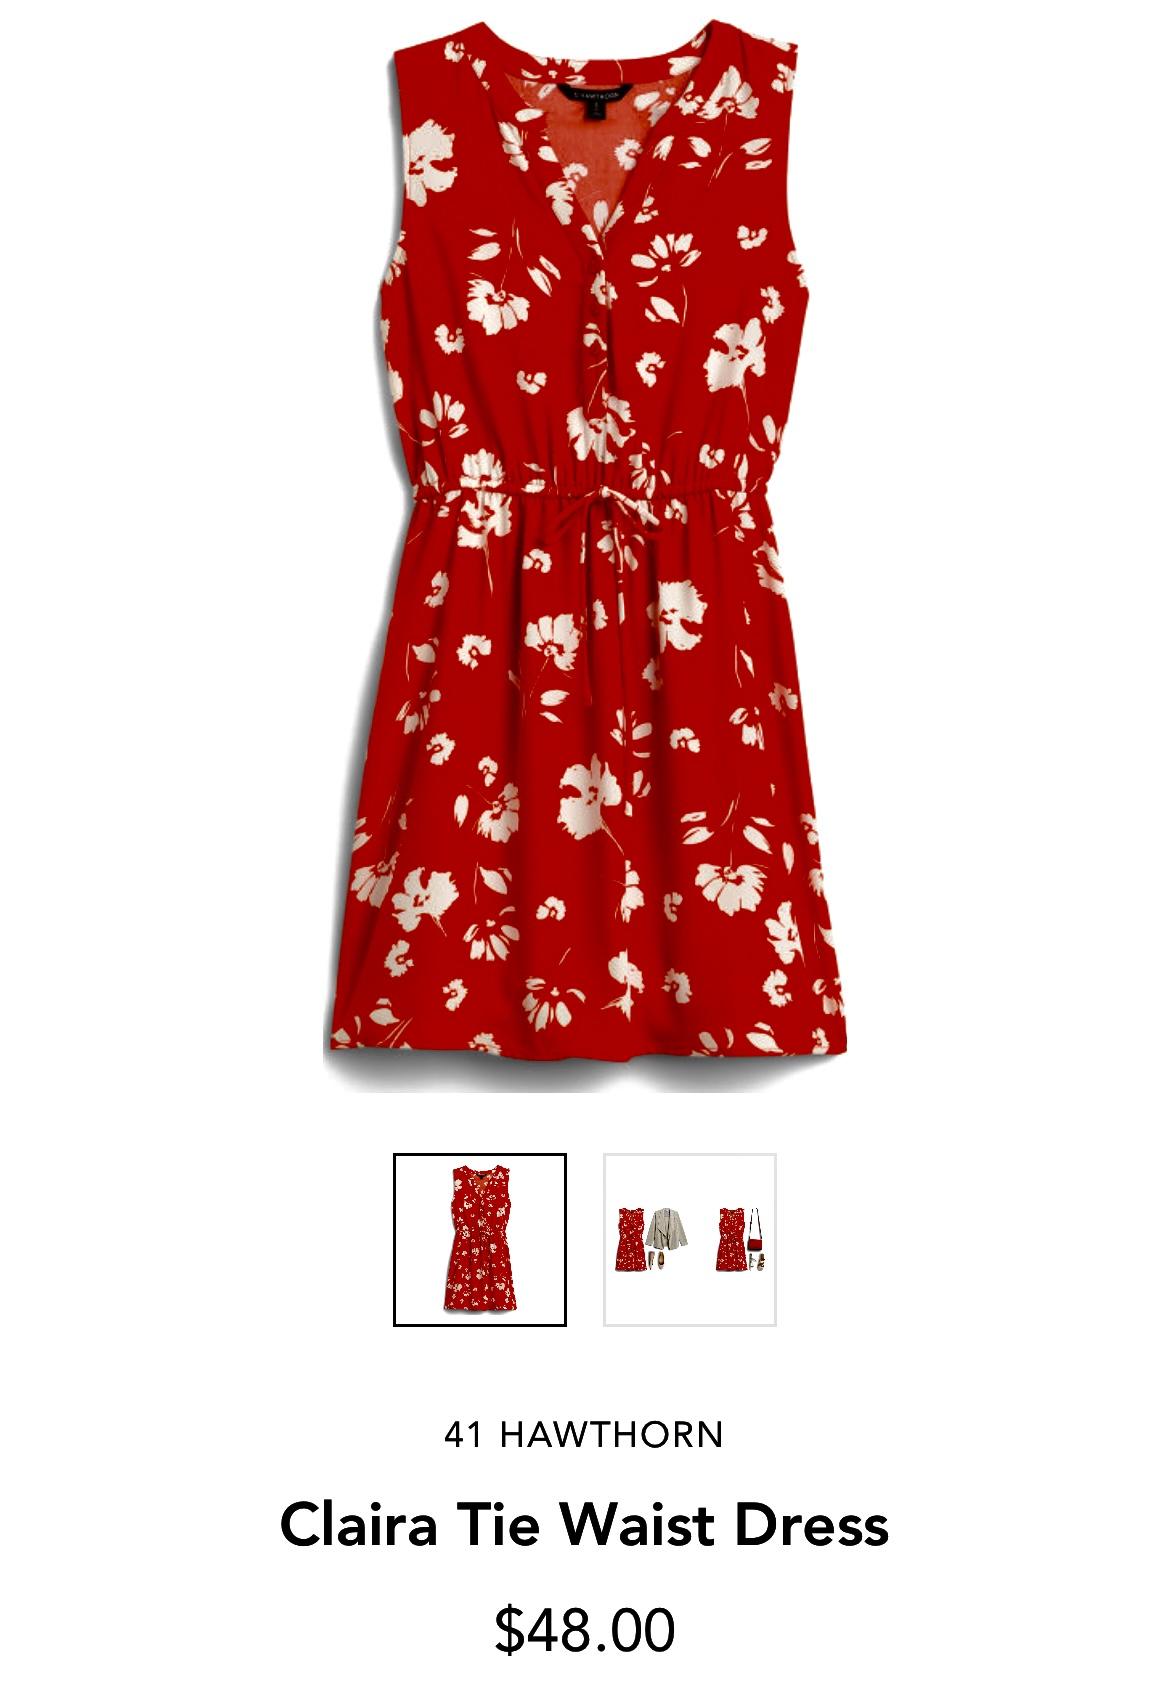 Stitch Fix 41 Hawthorn Claira Tie Waist Dress